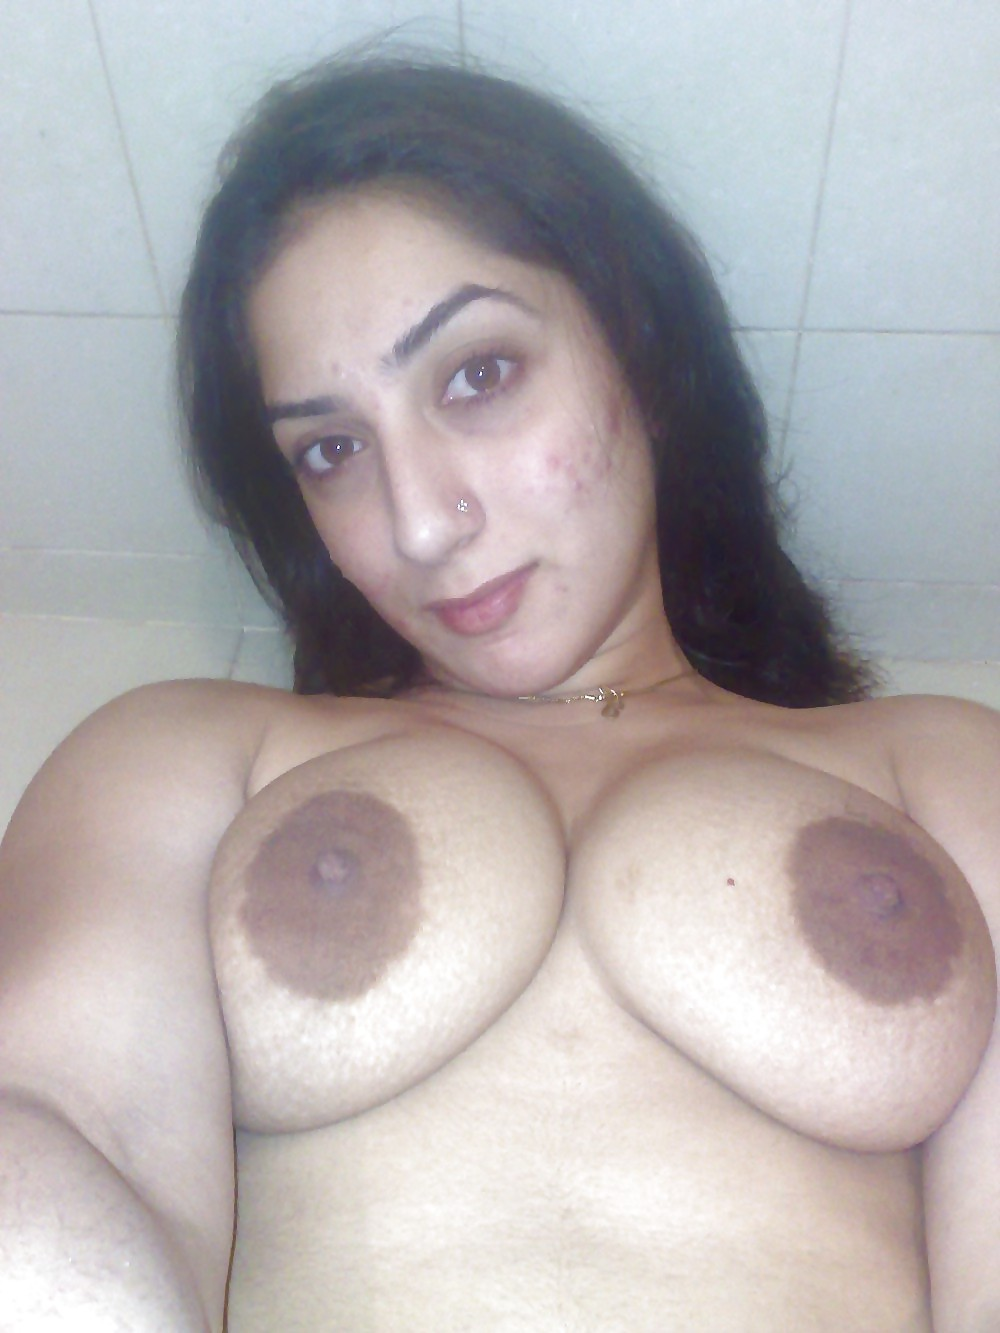 Iranian girl nude — pic 2